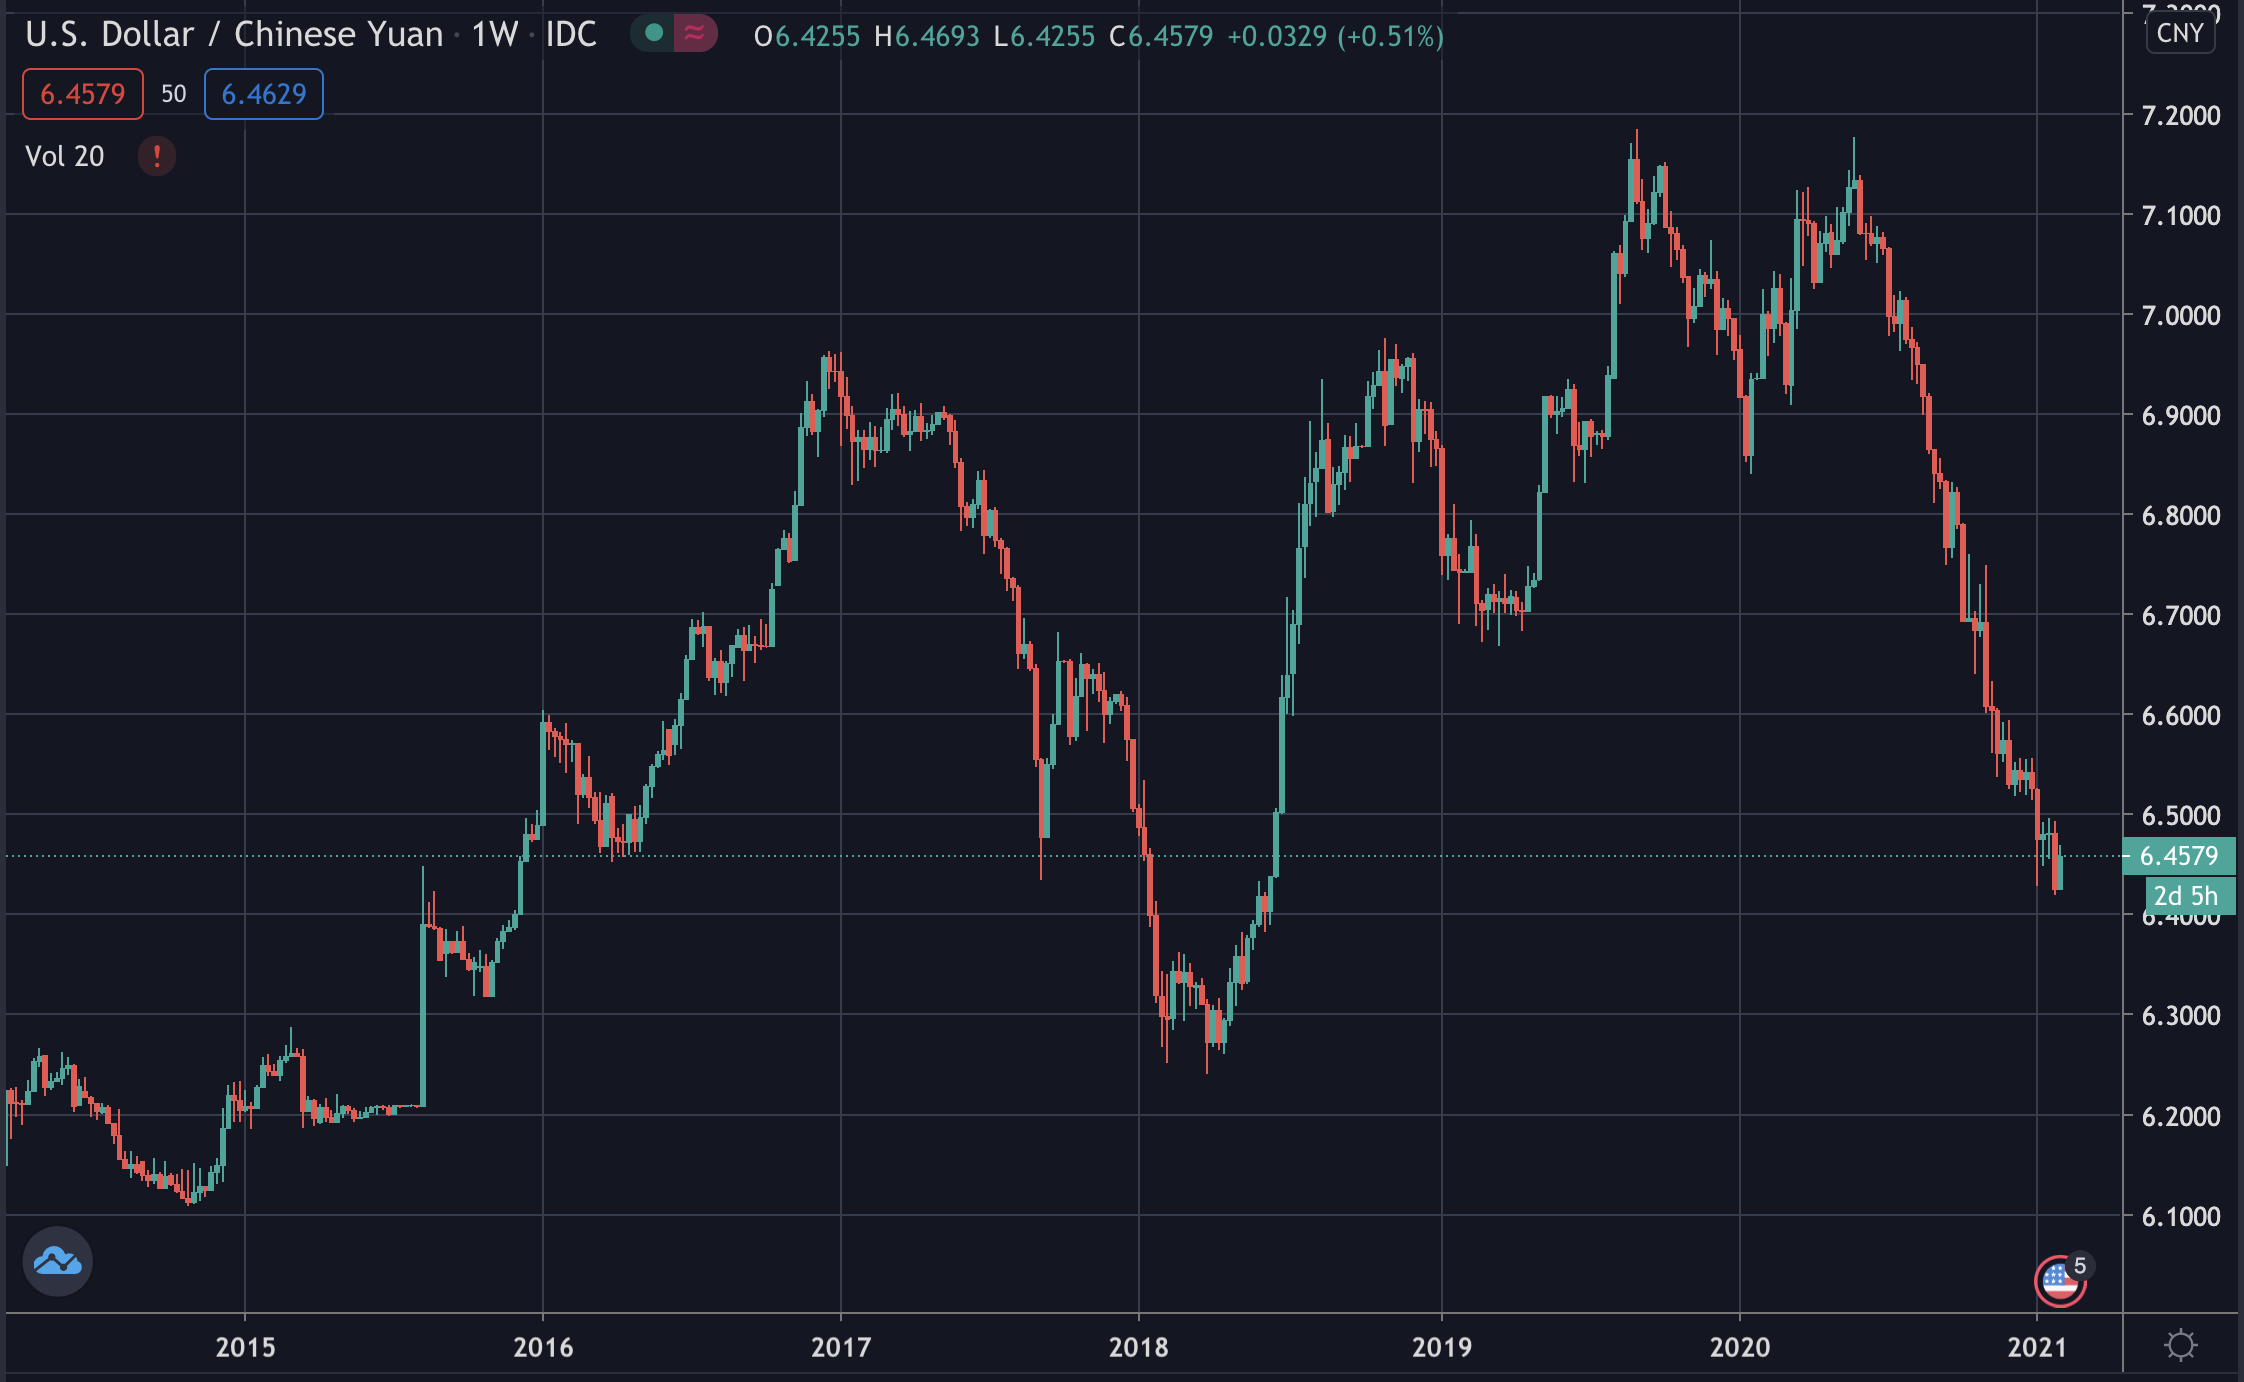 USD/CNY, Feb 2021